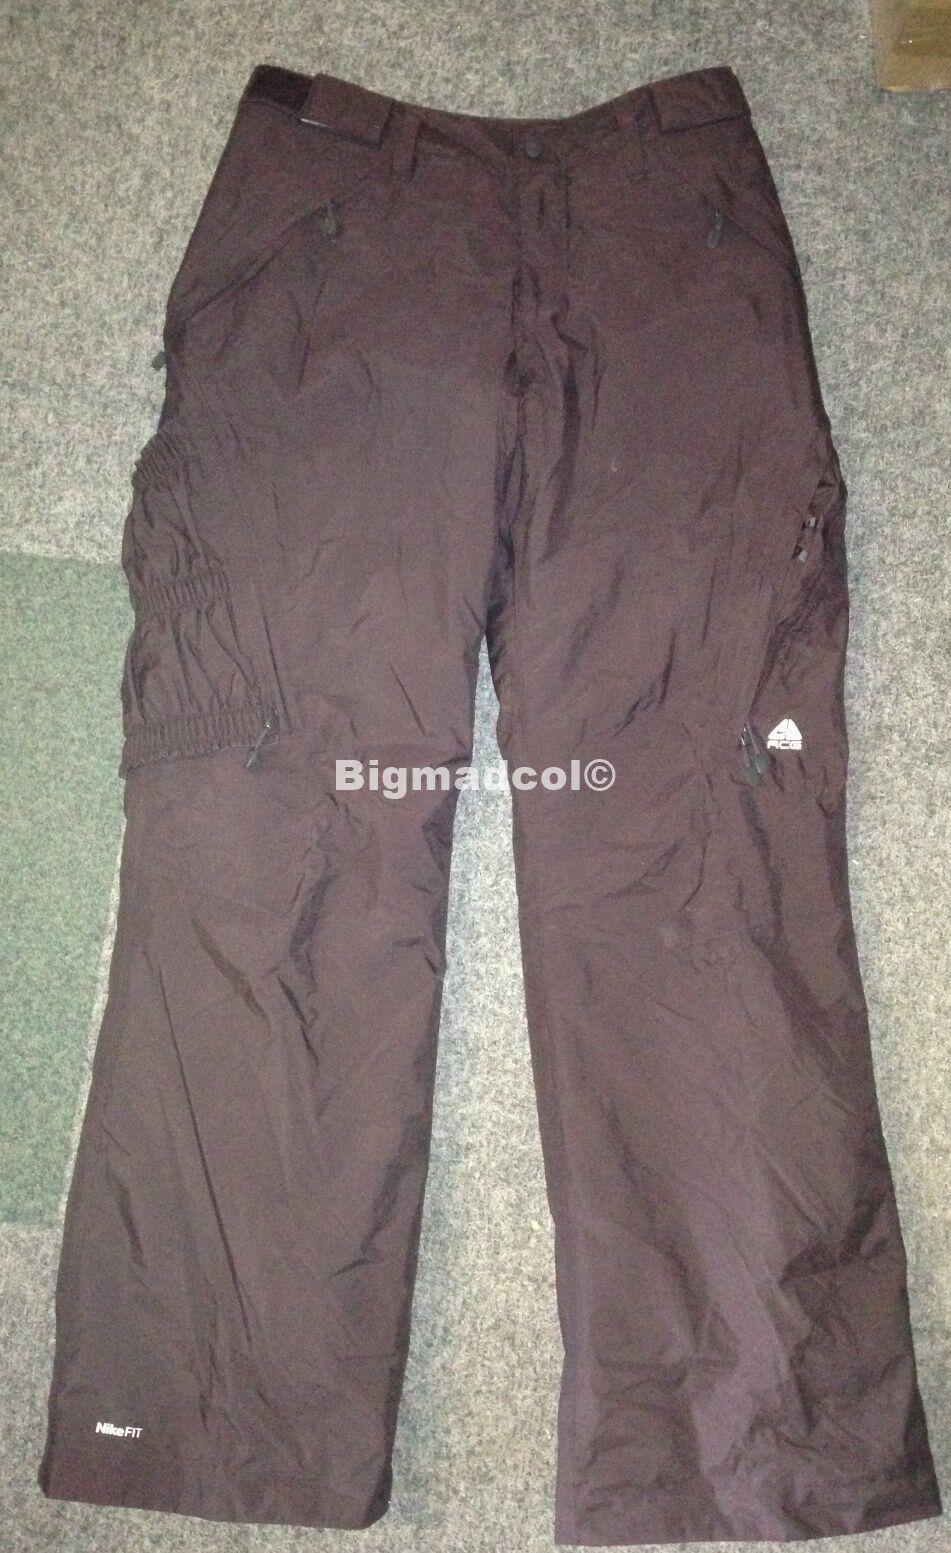 Nike ACG Ski Snowboarding Ladies Salopettes Brown Large 14 16  NEW